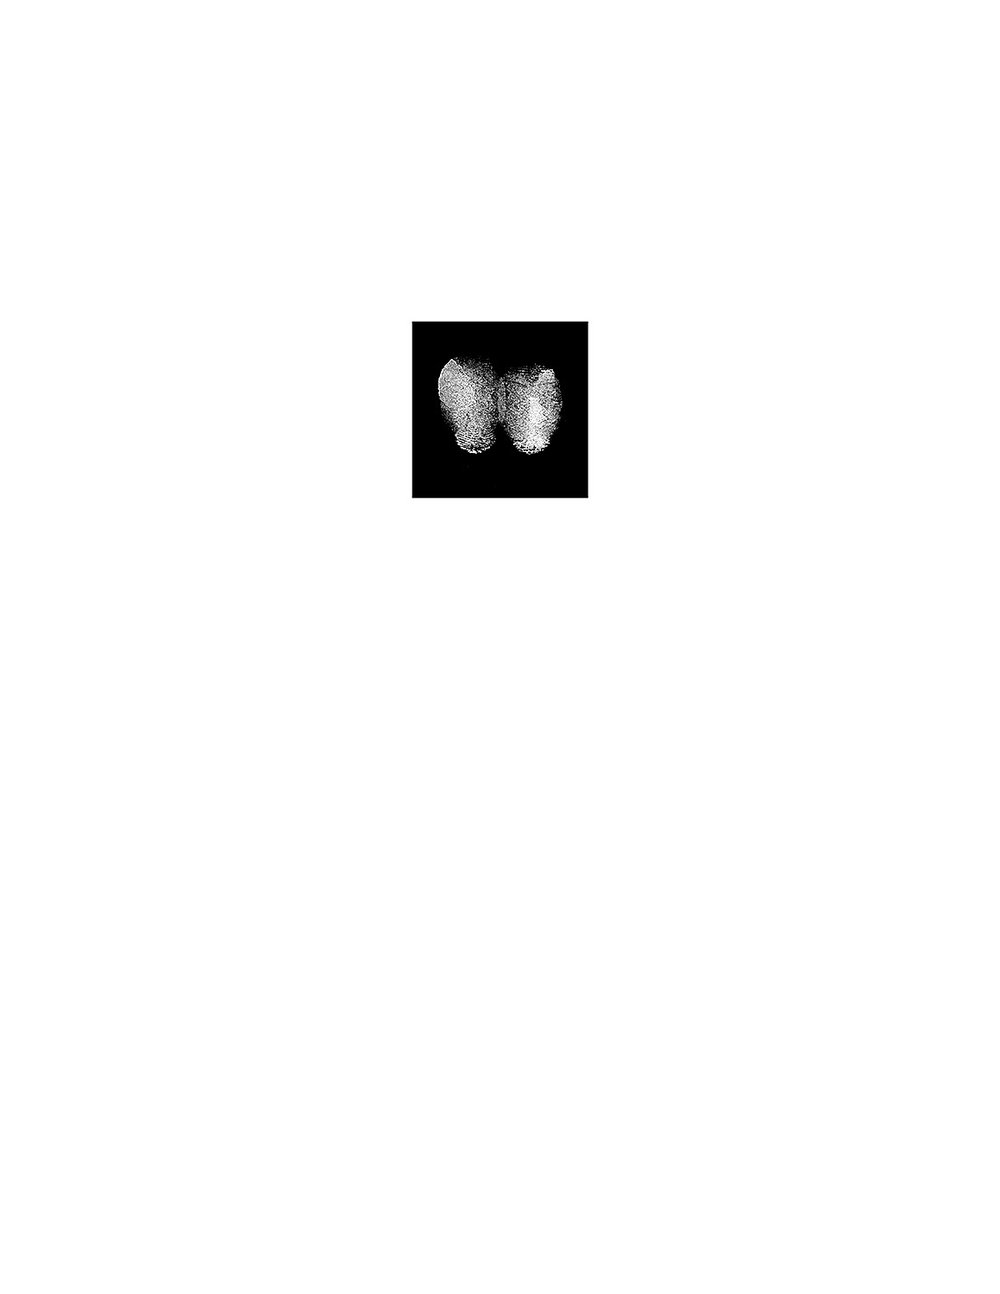 Symmetrical Identities